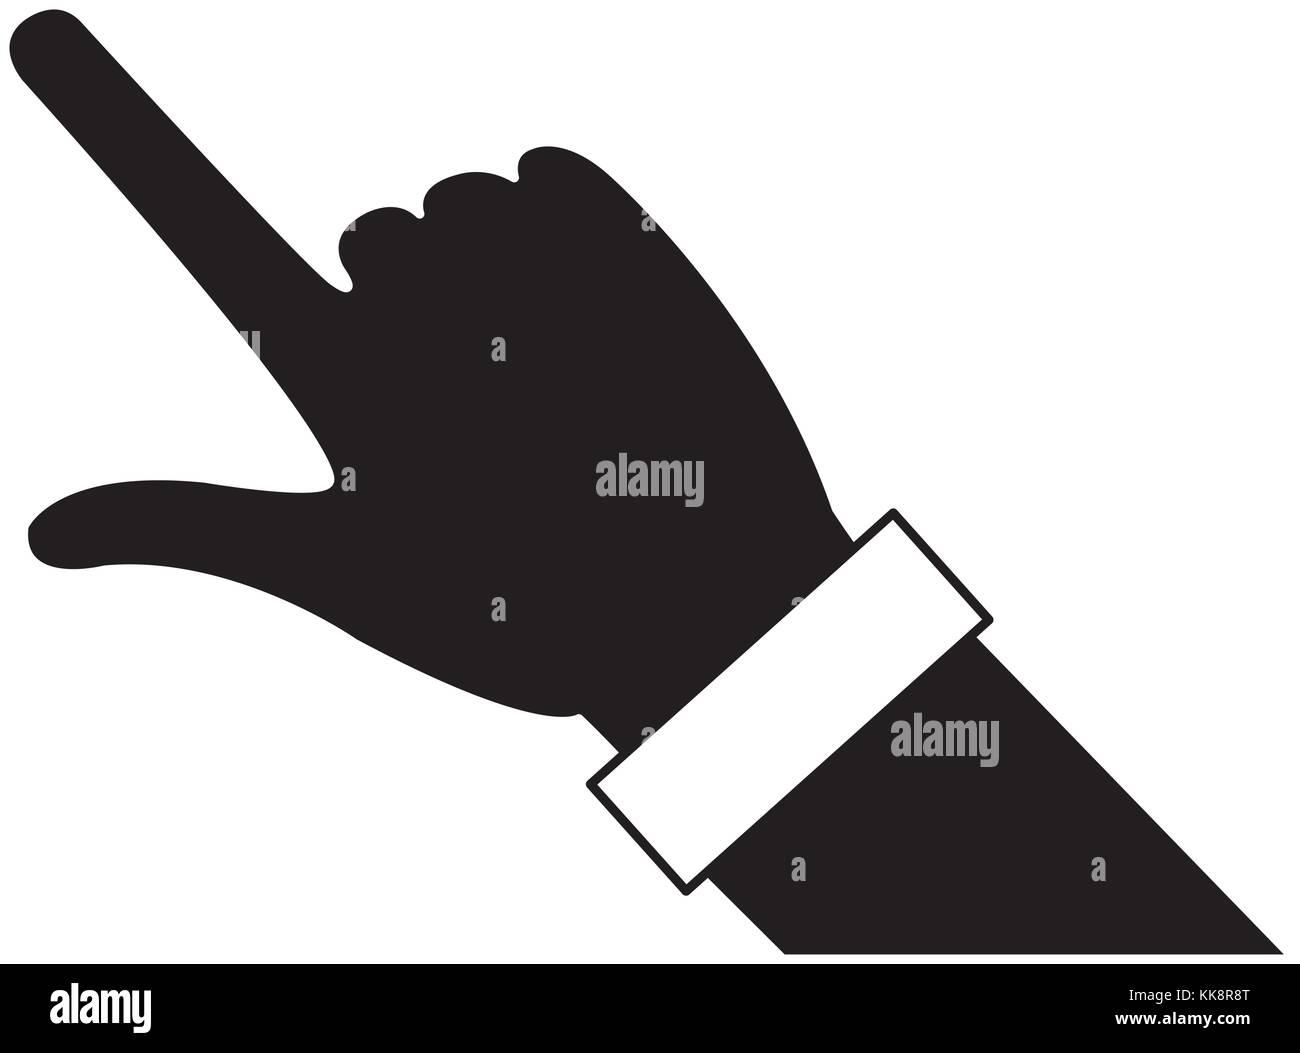 Human hand design - Stock Vector